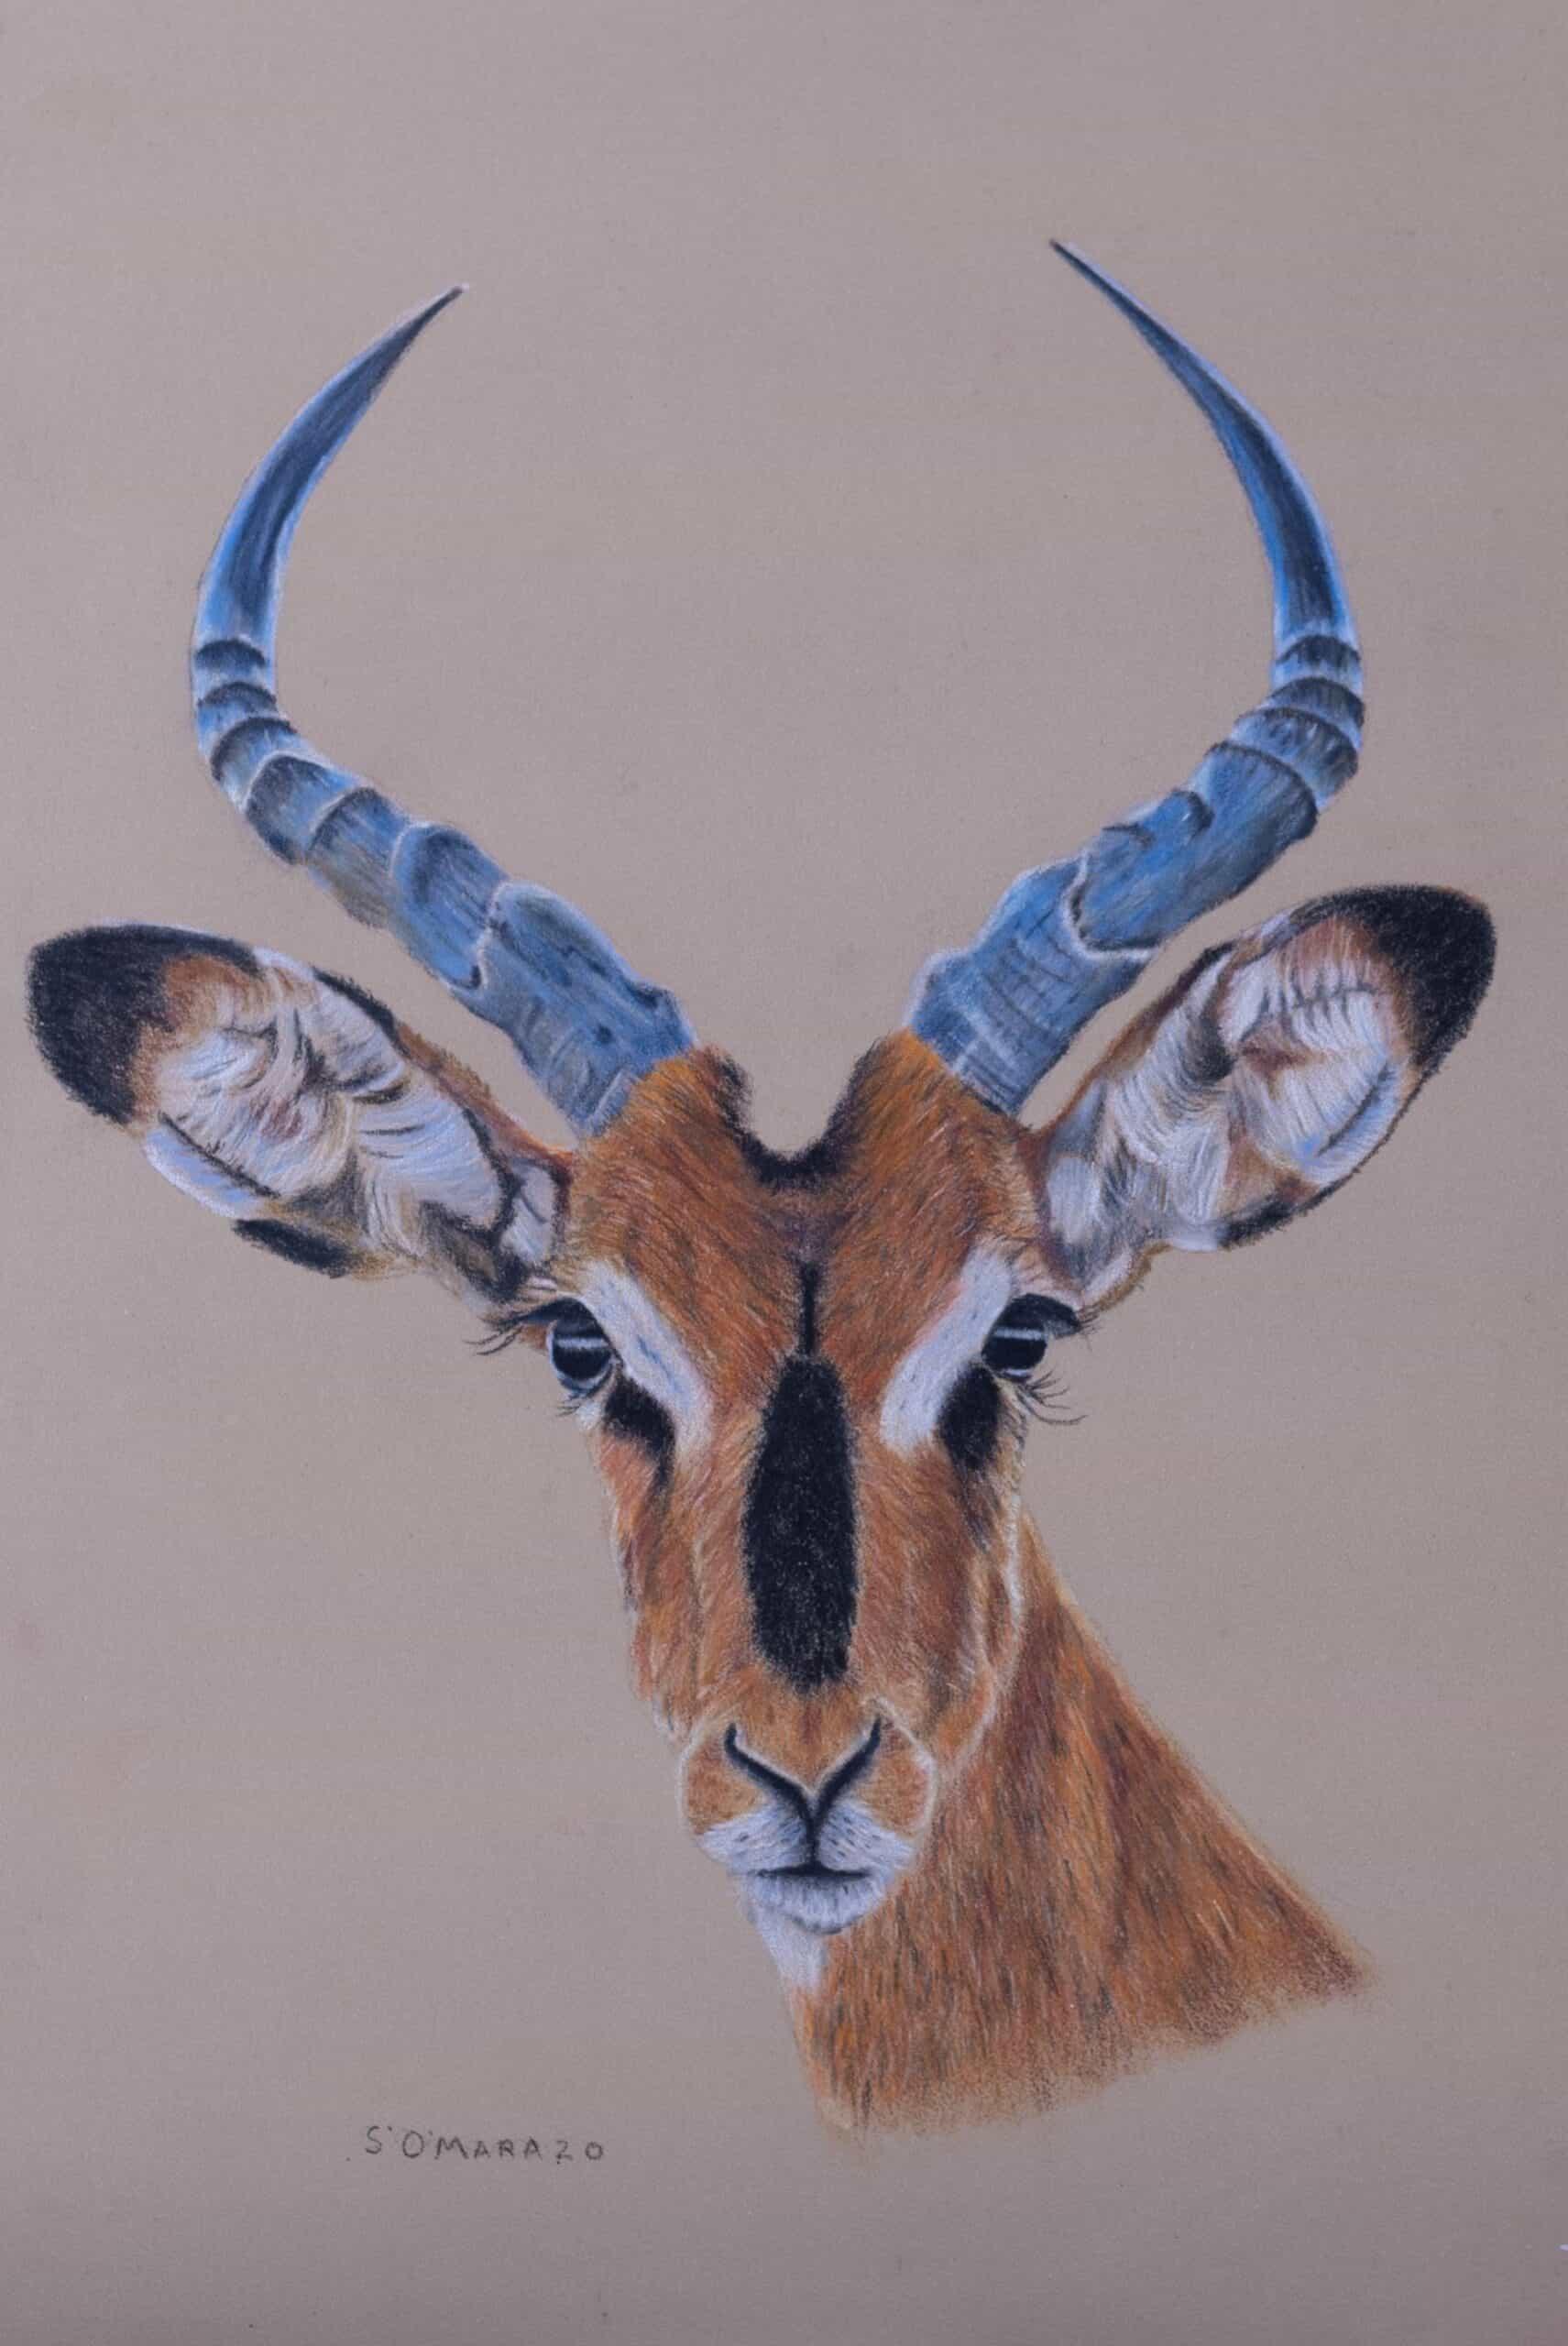 Impassive Impala